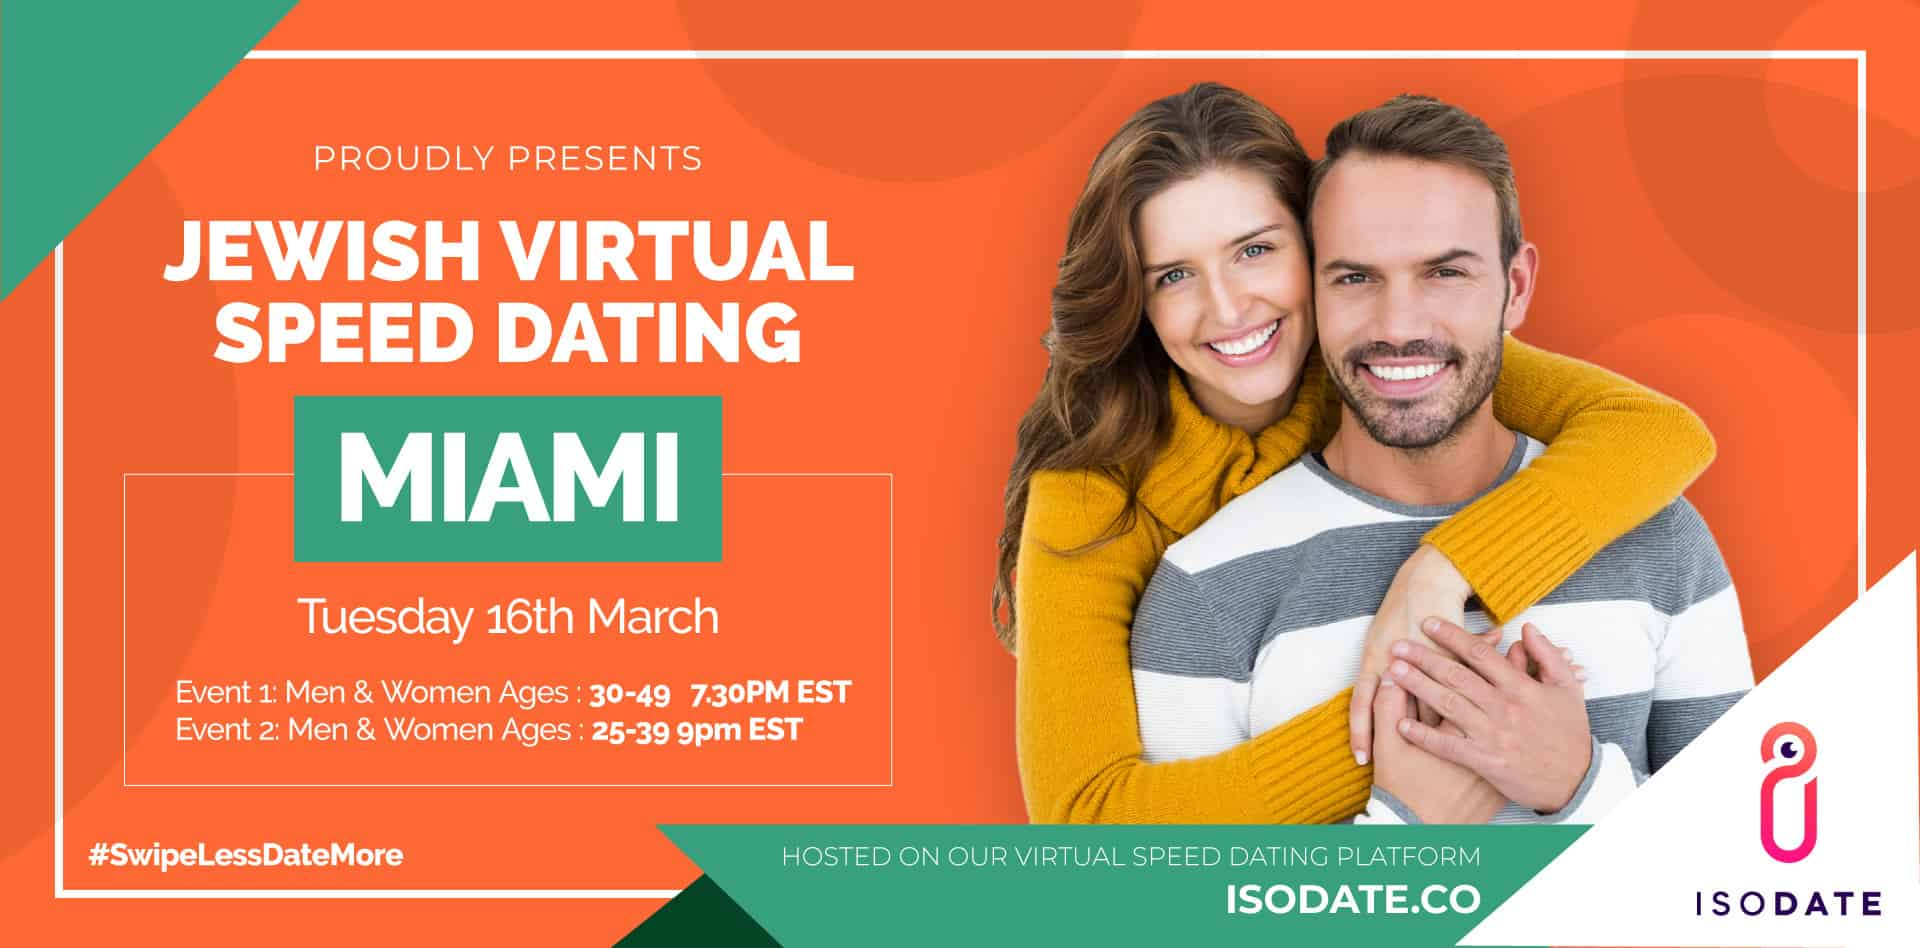 Isodate's Miami Jewish Virtual Speed Dating - Swipe Less, Date More